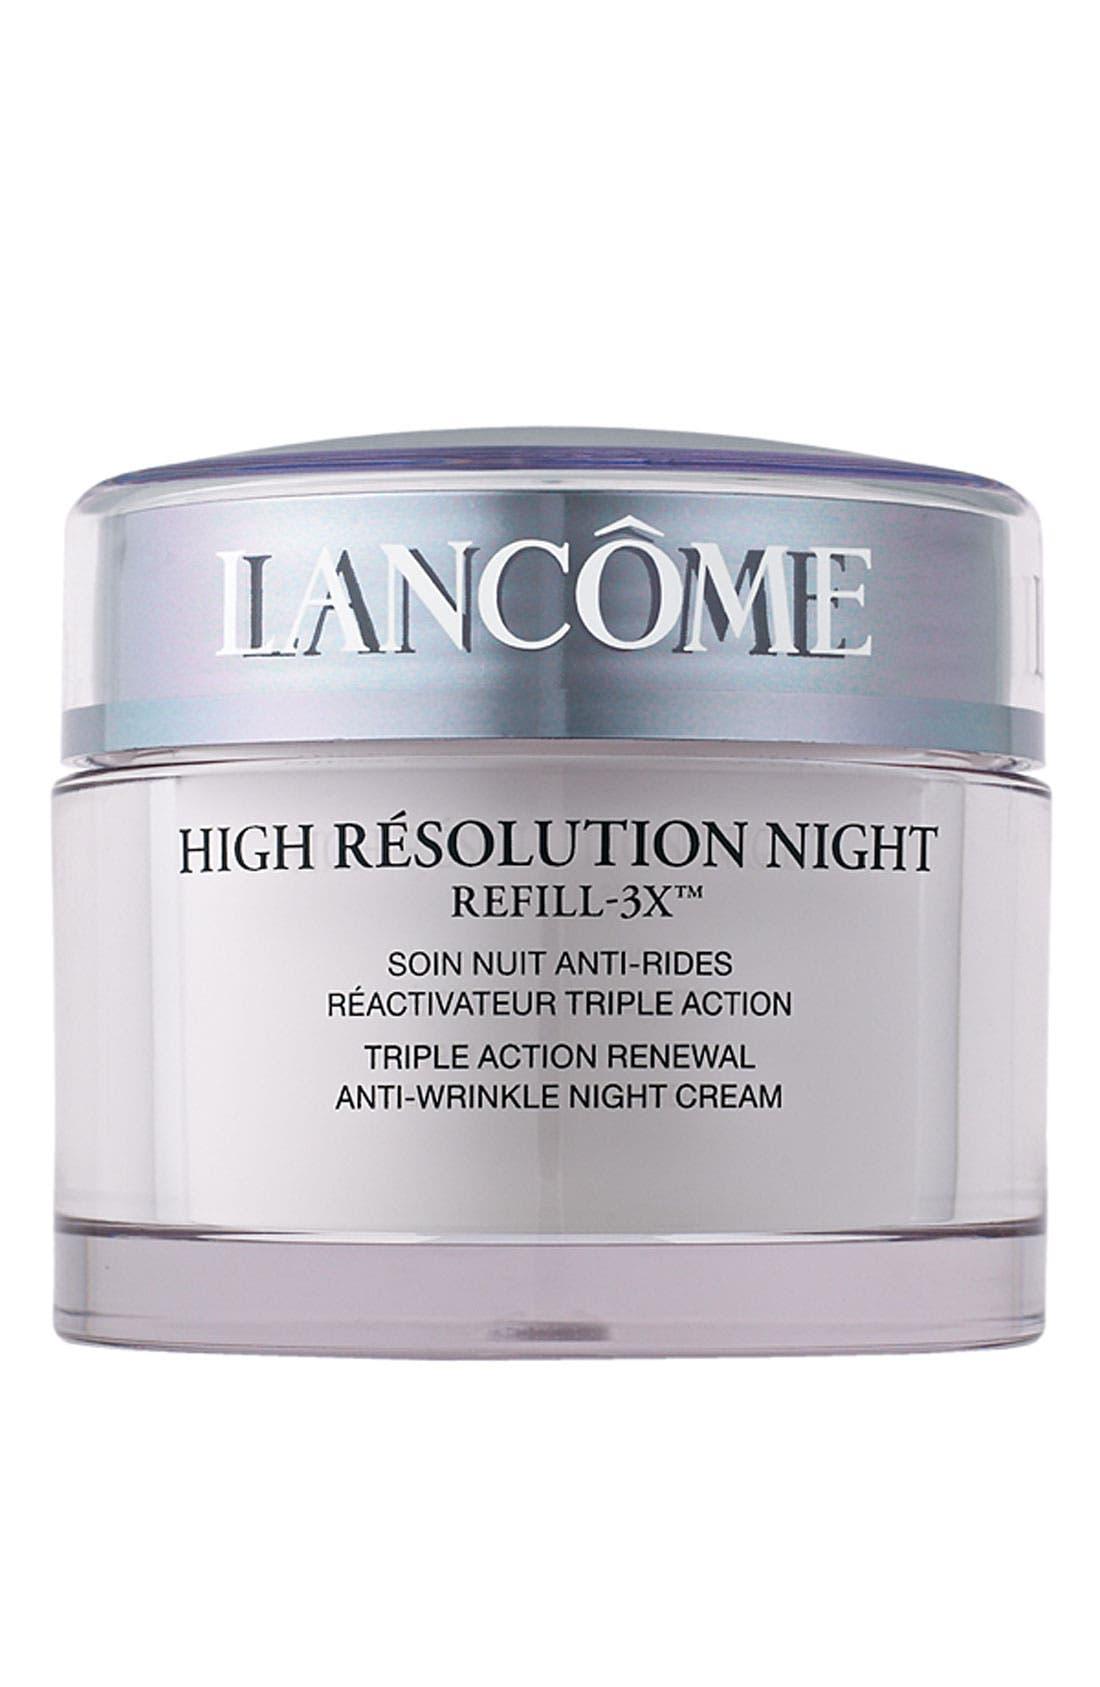 Lancôme High Résolution Refill-3X Anti-Wrinkle Night Moisturizer Cream